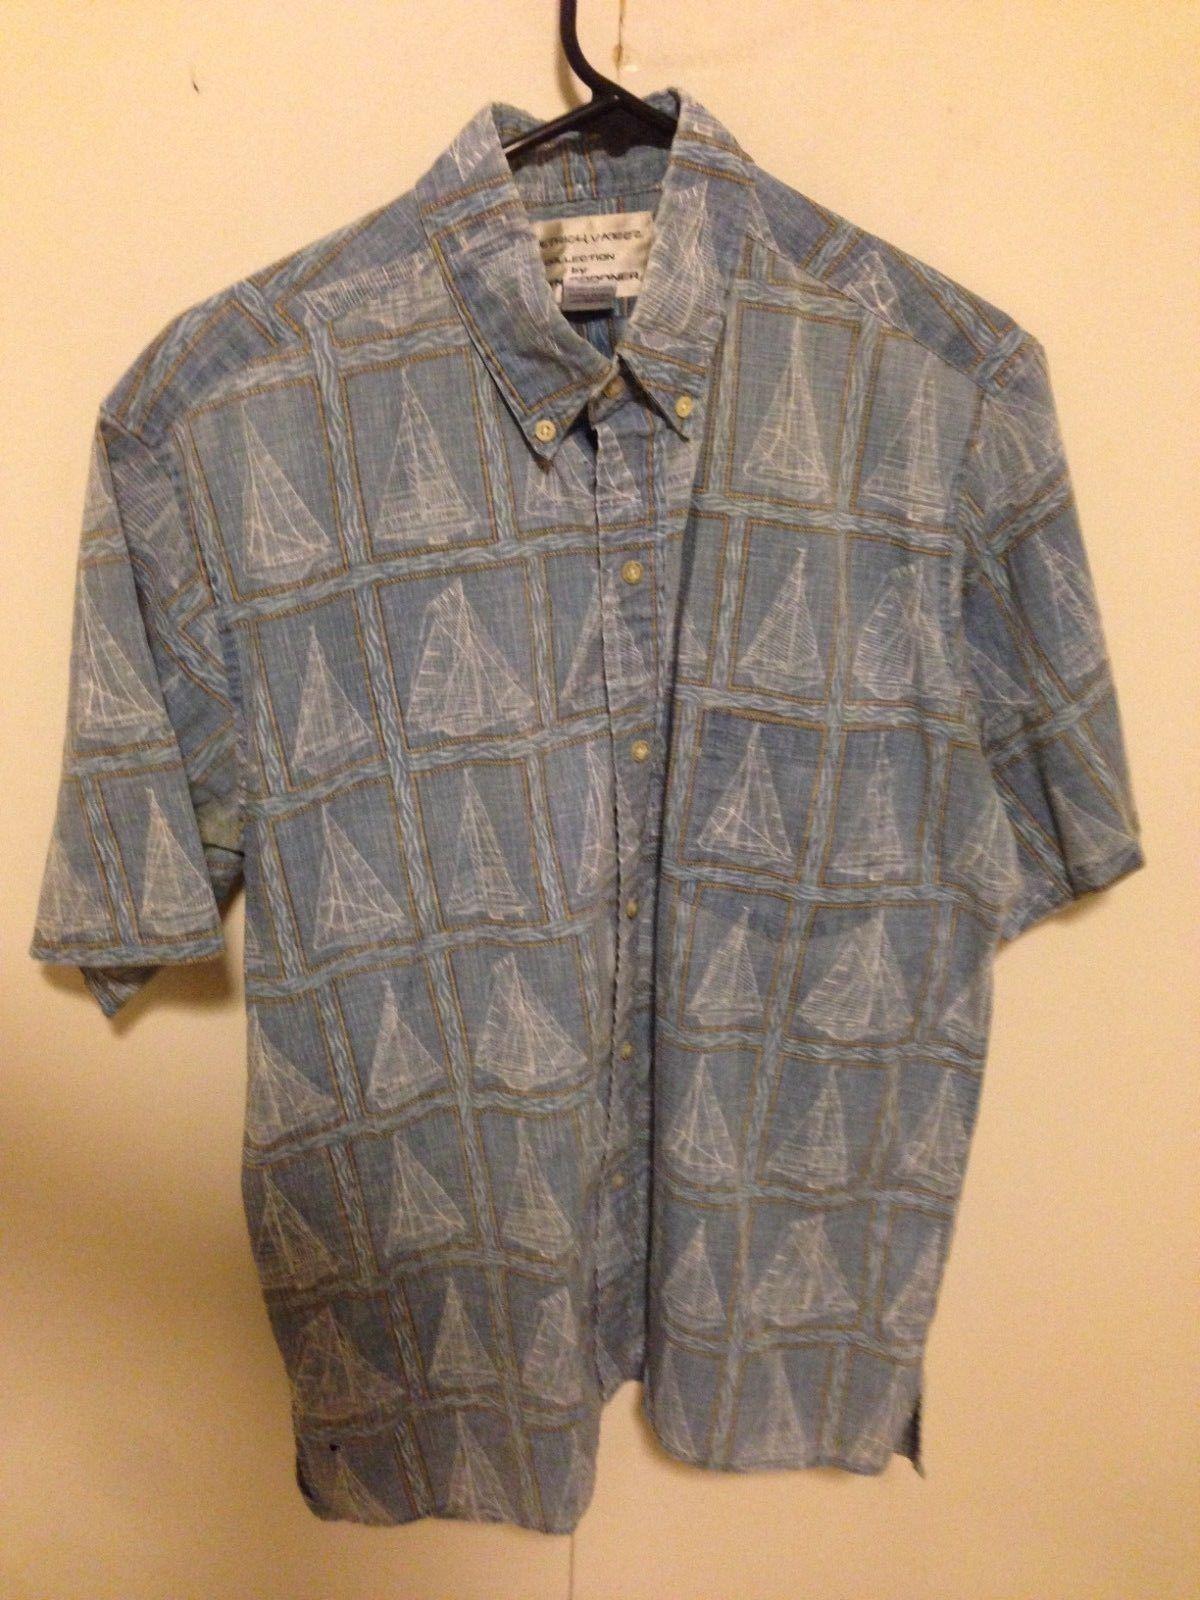 7eaaba1c S l1600. S l1600. Previous. Reyn Spooner Mens Shirt M Detrich Varez Reverse  blue sailboats Hawaiian Aloha